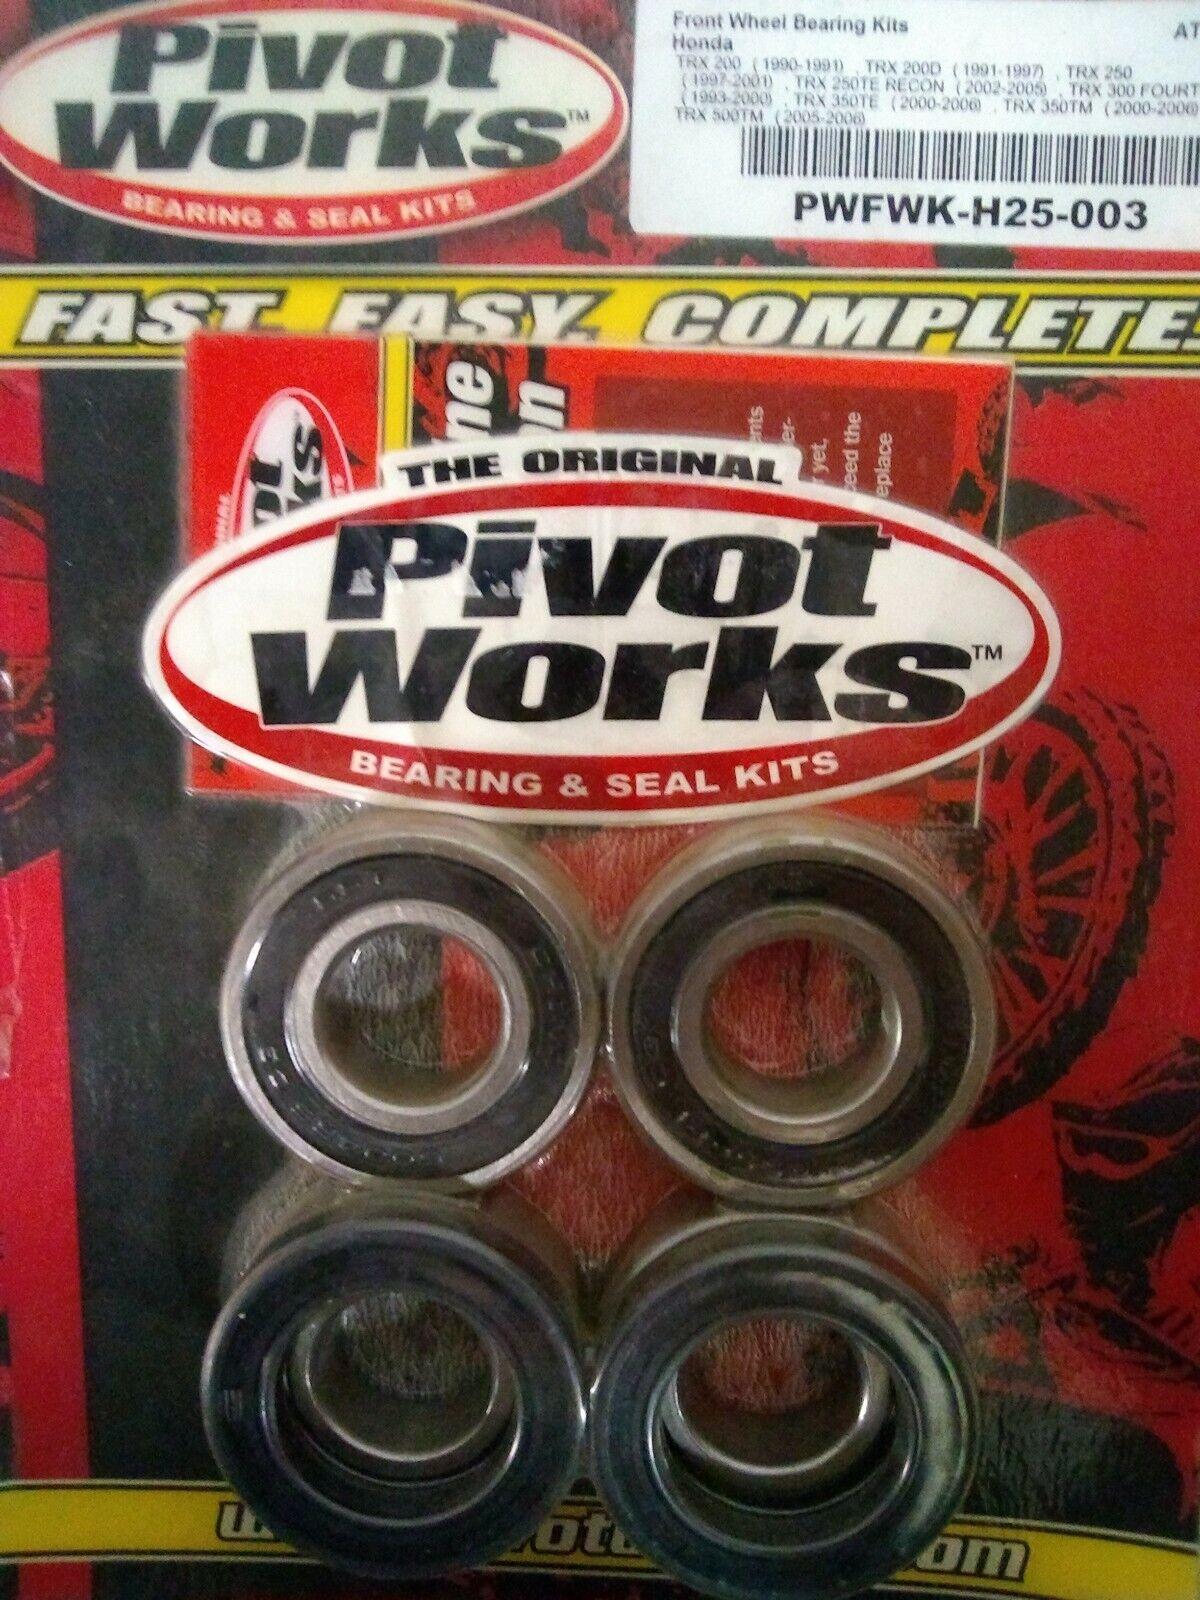 Pivot Works Rear Wheel Bearing Kit for Honda TRX300FW FourTrax 300 4x4 1990-1997